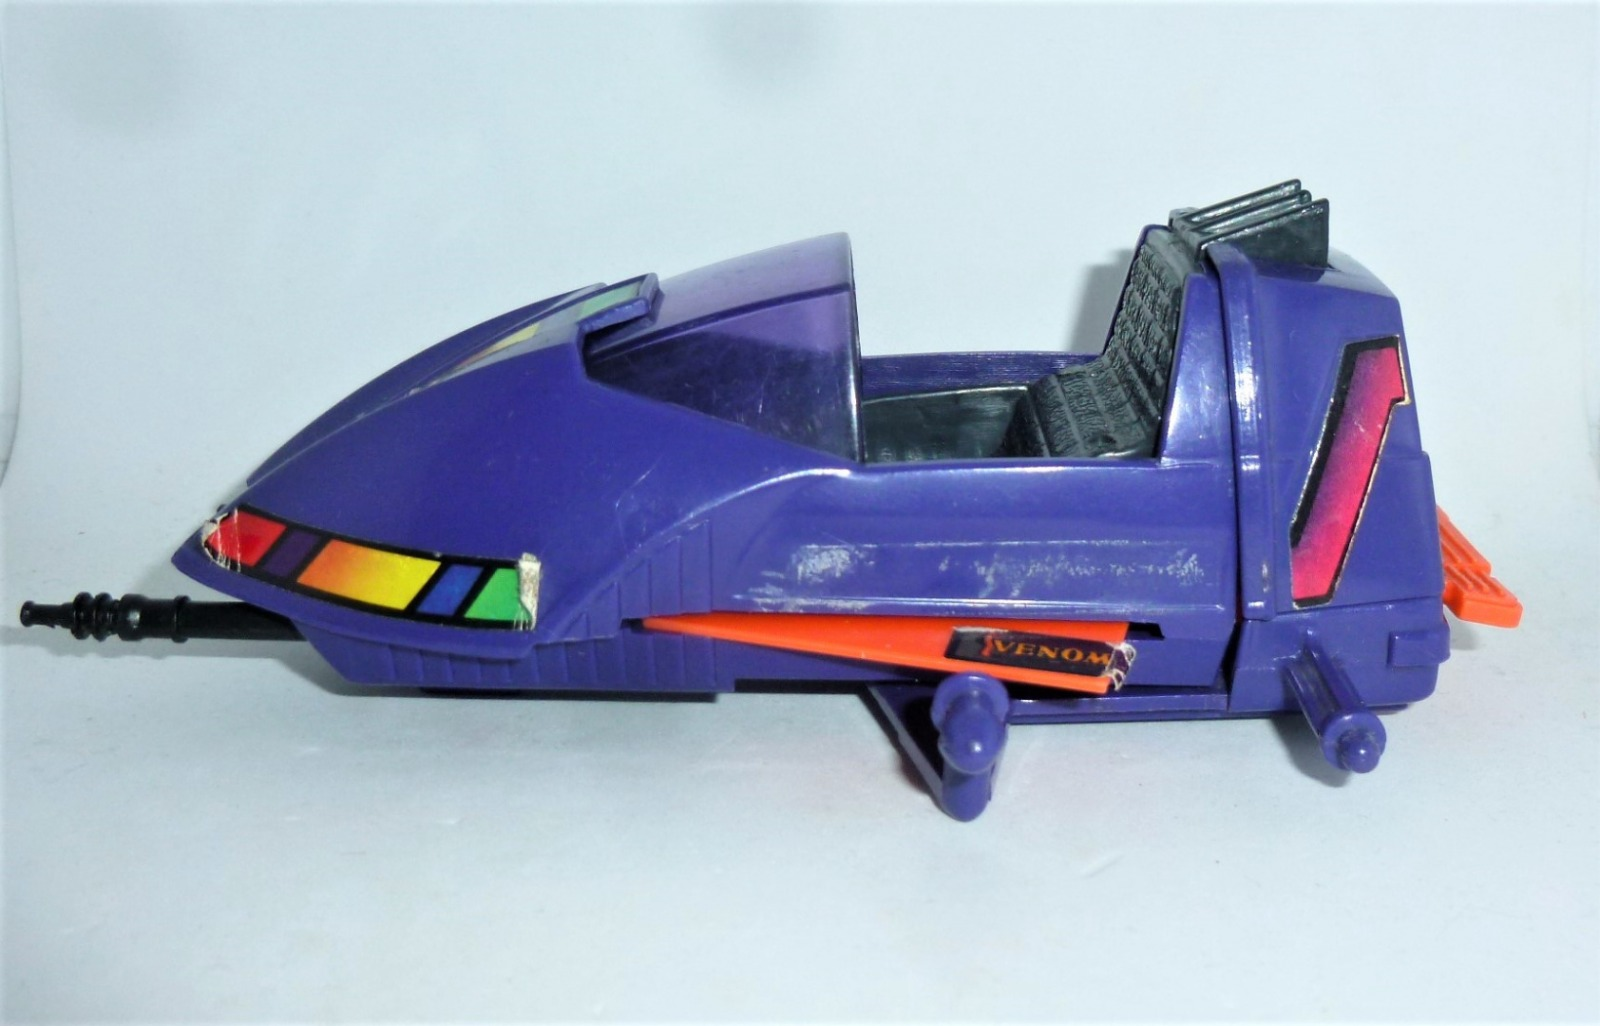 Piranha - Side Car / Submarine & Sly Rax - M.A.S.K. / MASK - 2